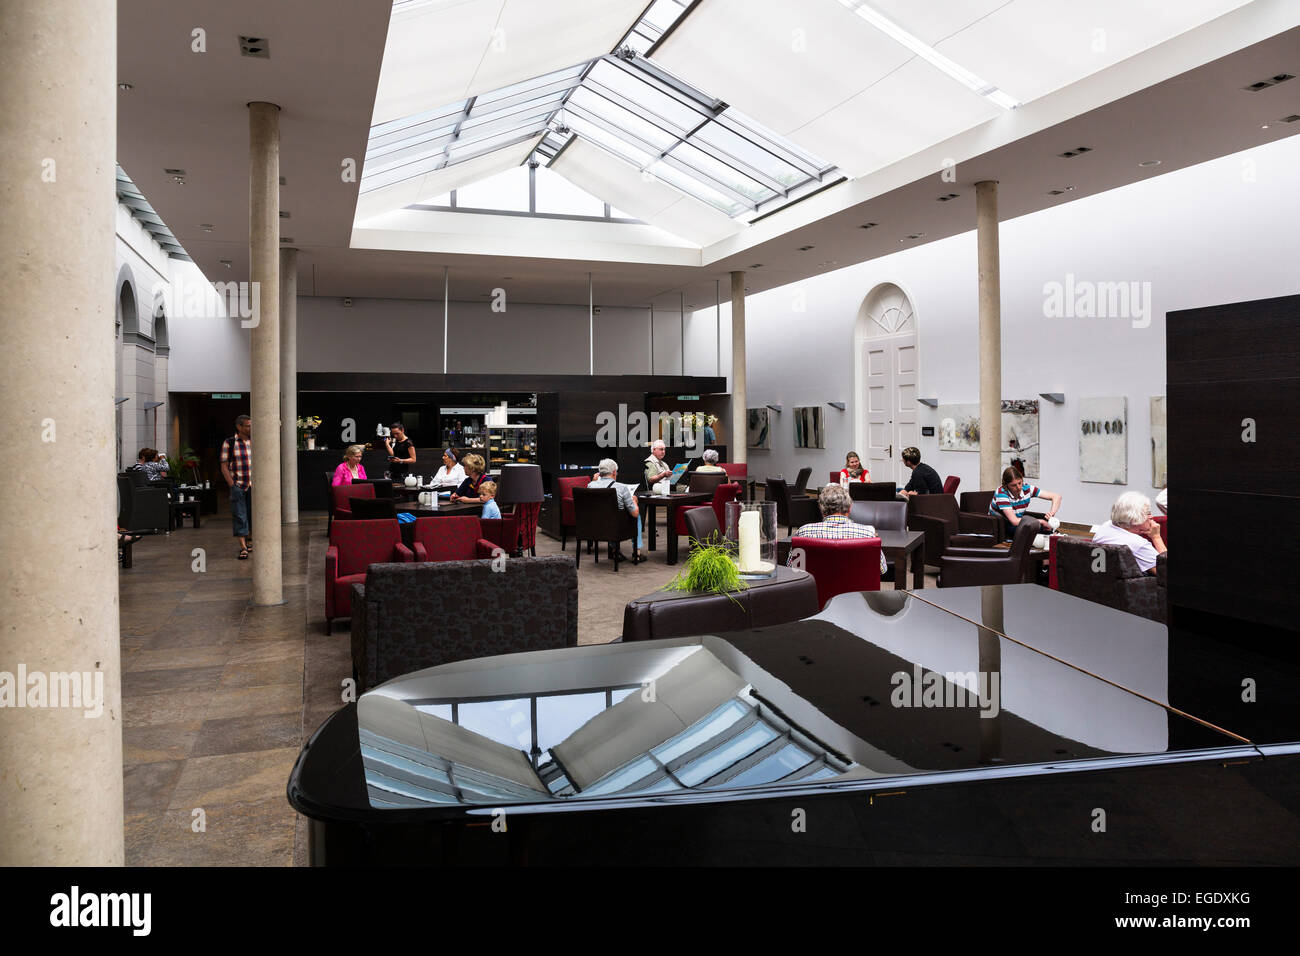 Conversation building, Norderney Island, Nationalpark, North Sea, East Frisian Islands, East Frisia, Lower Saxony, Stock Photo